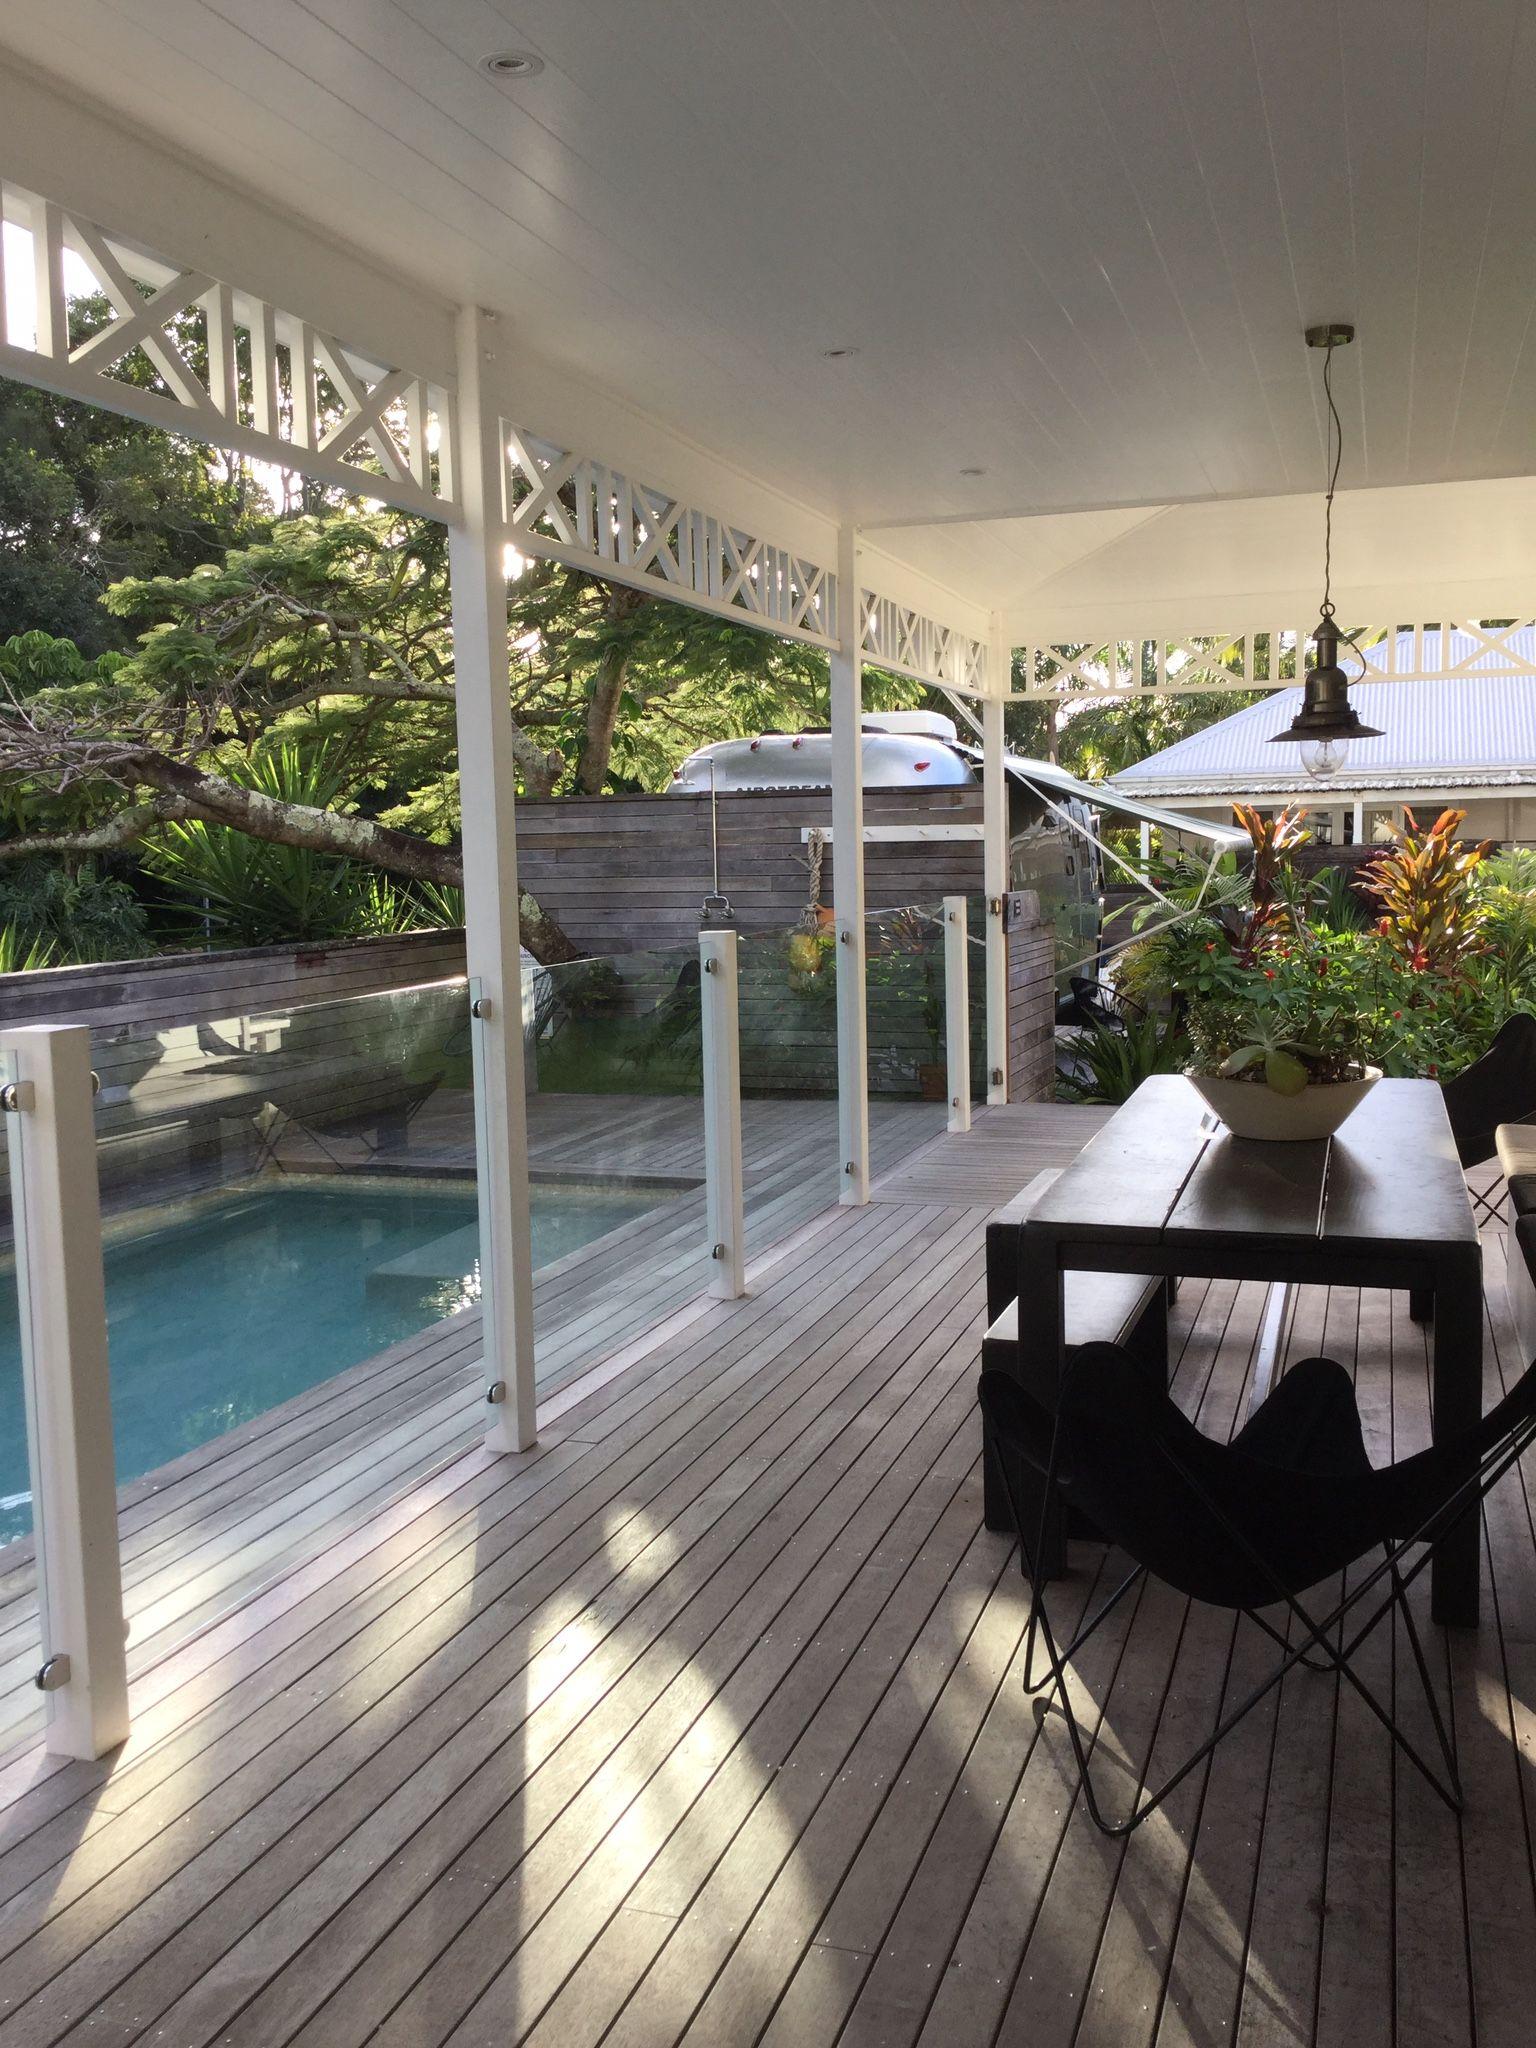 The Atlantic Byron Bay Australia Pool Houses Small Backyard Pools Pergola